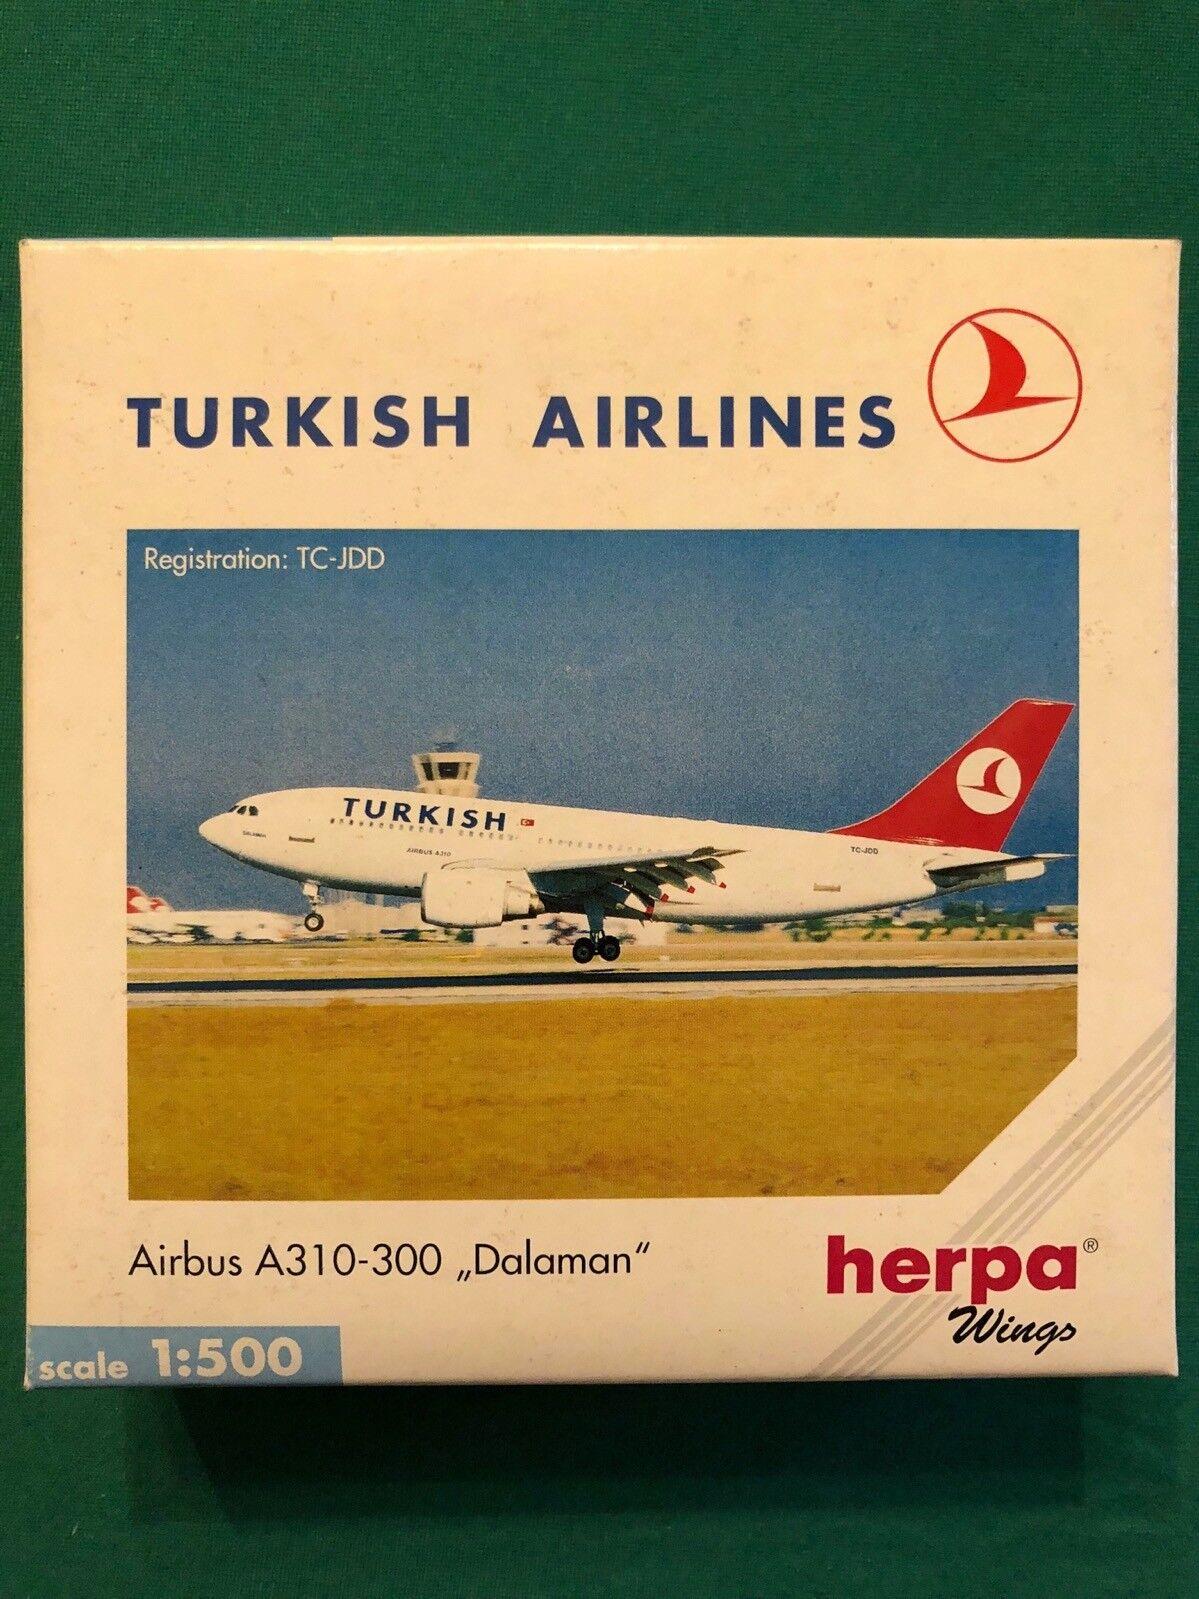 "Airbus A310-300 ""Dalaman"" TC-JDD Turkish Airlines. Herpa Wings 1 500 n.501064"